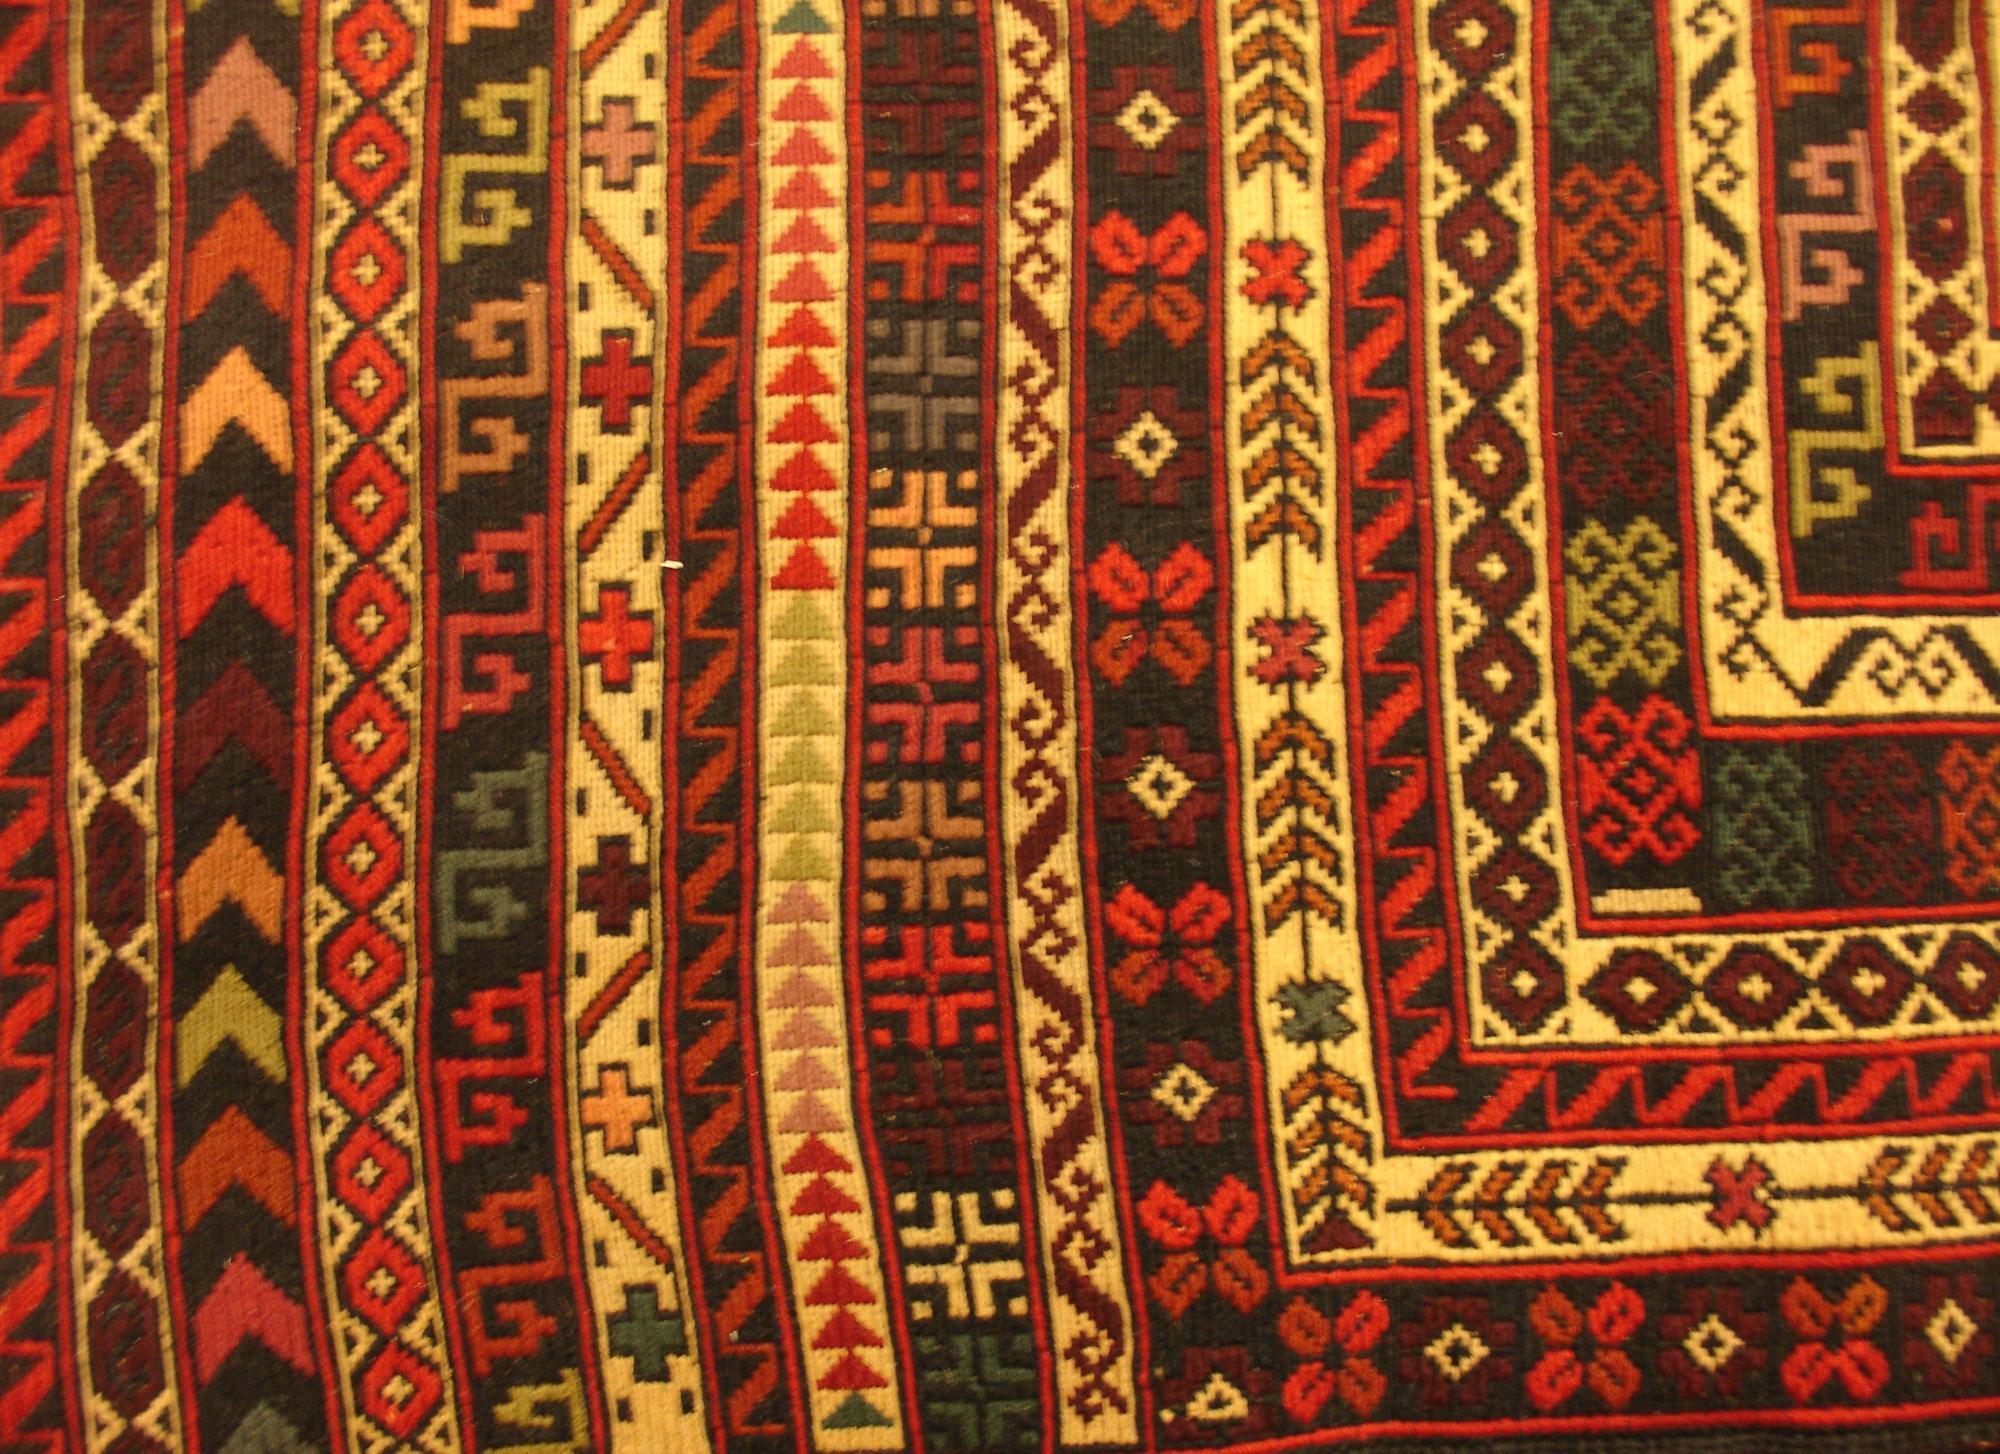 Афганский ковер из шерсти Килим ZОГ173WW